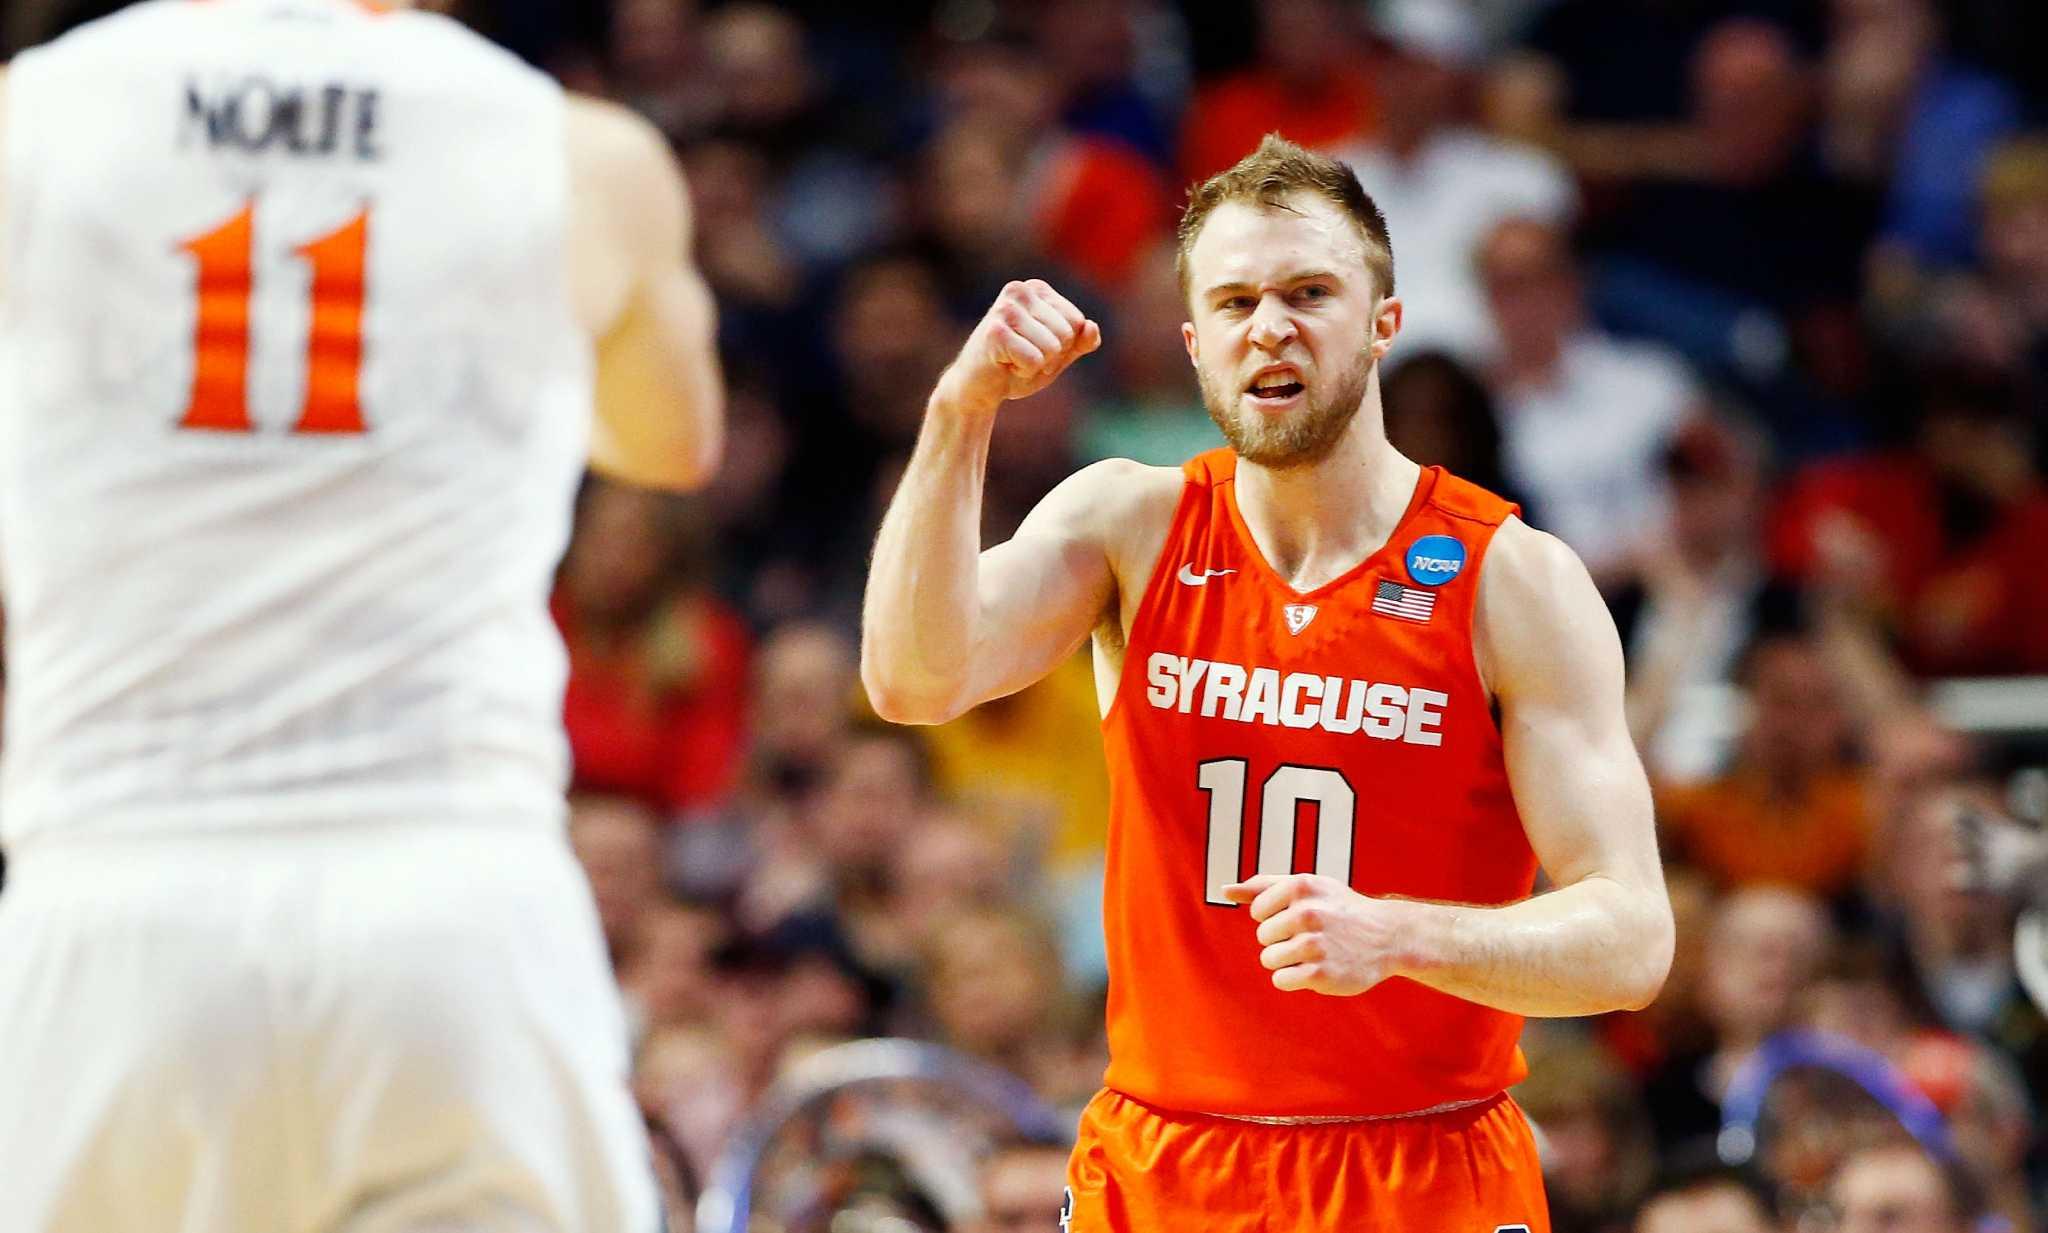 Syracuse North Carolina Deal With Adversity Houston Chronicle